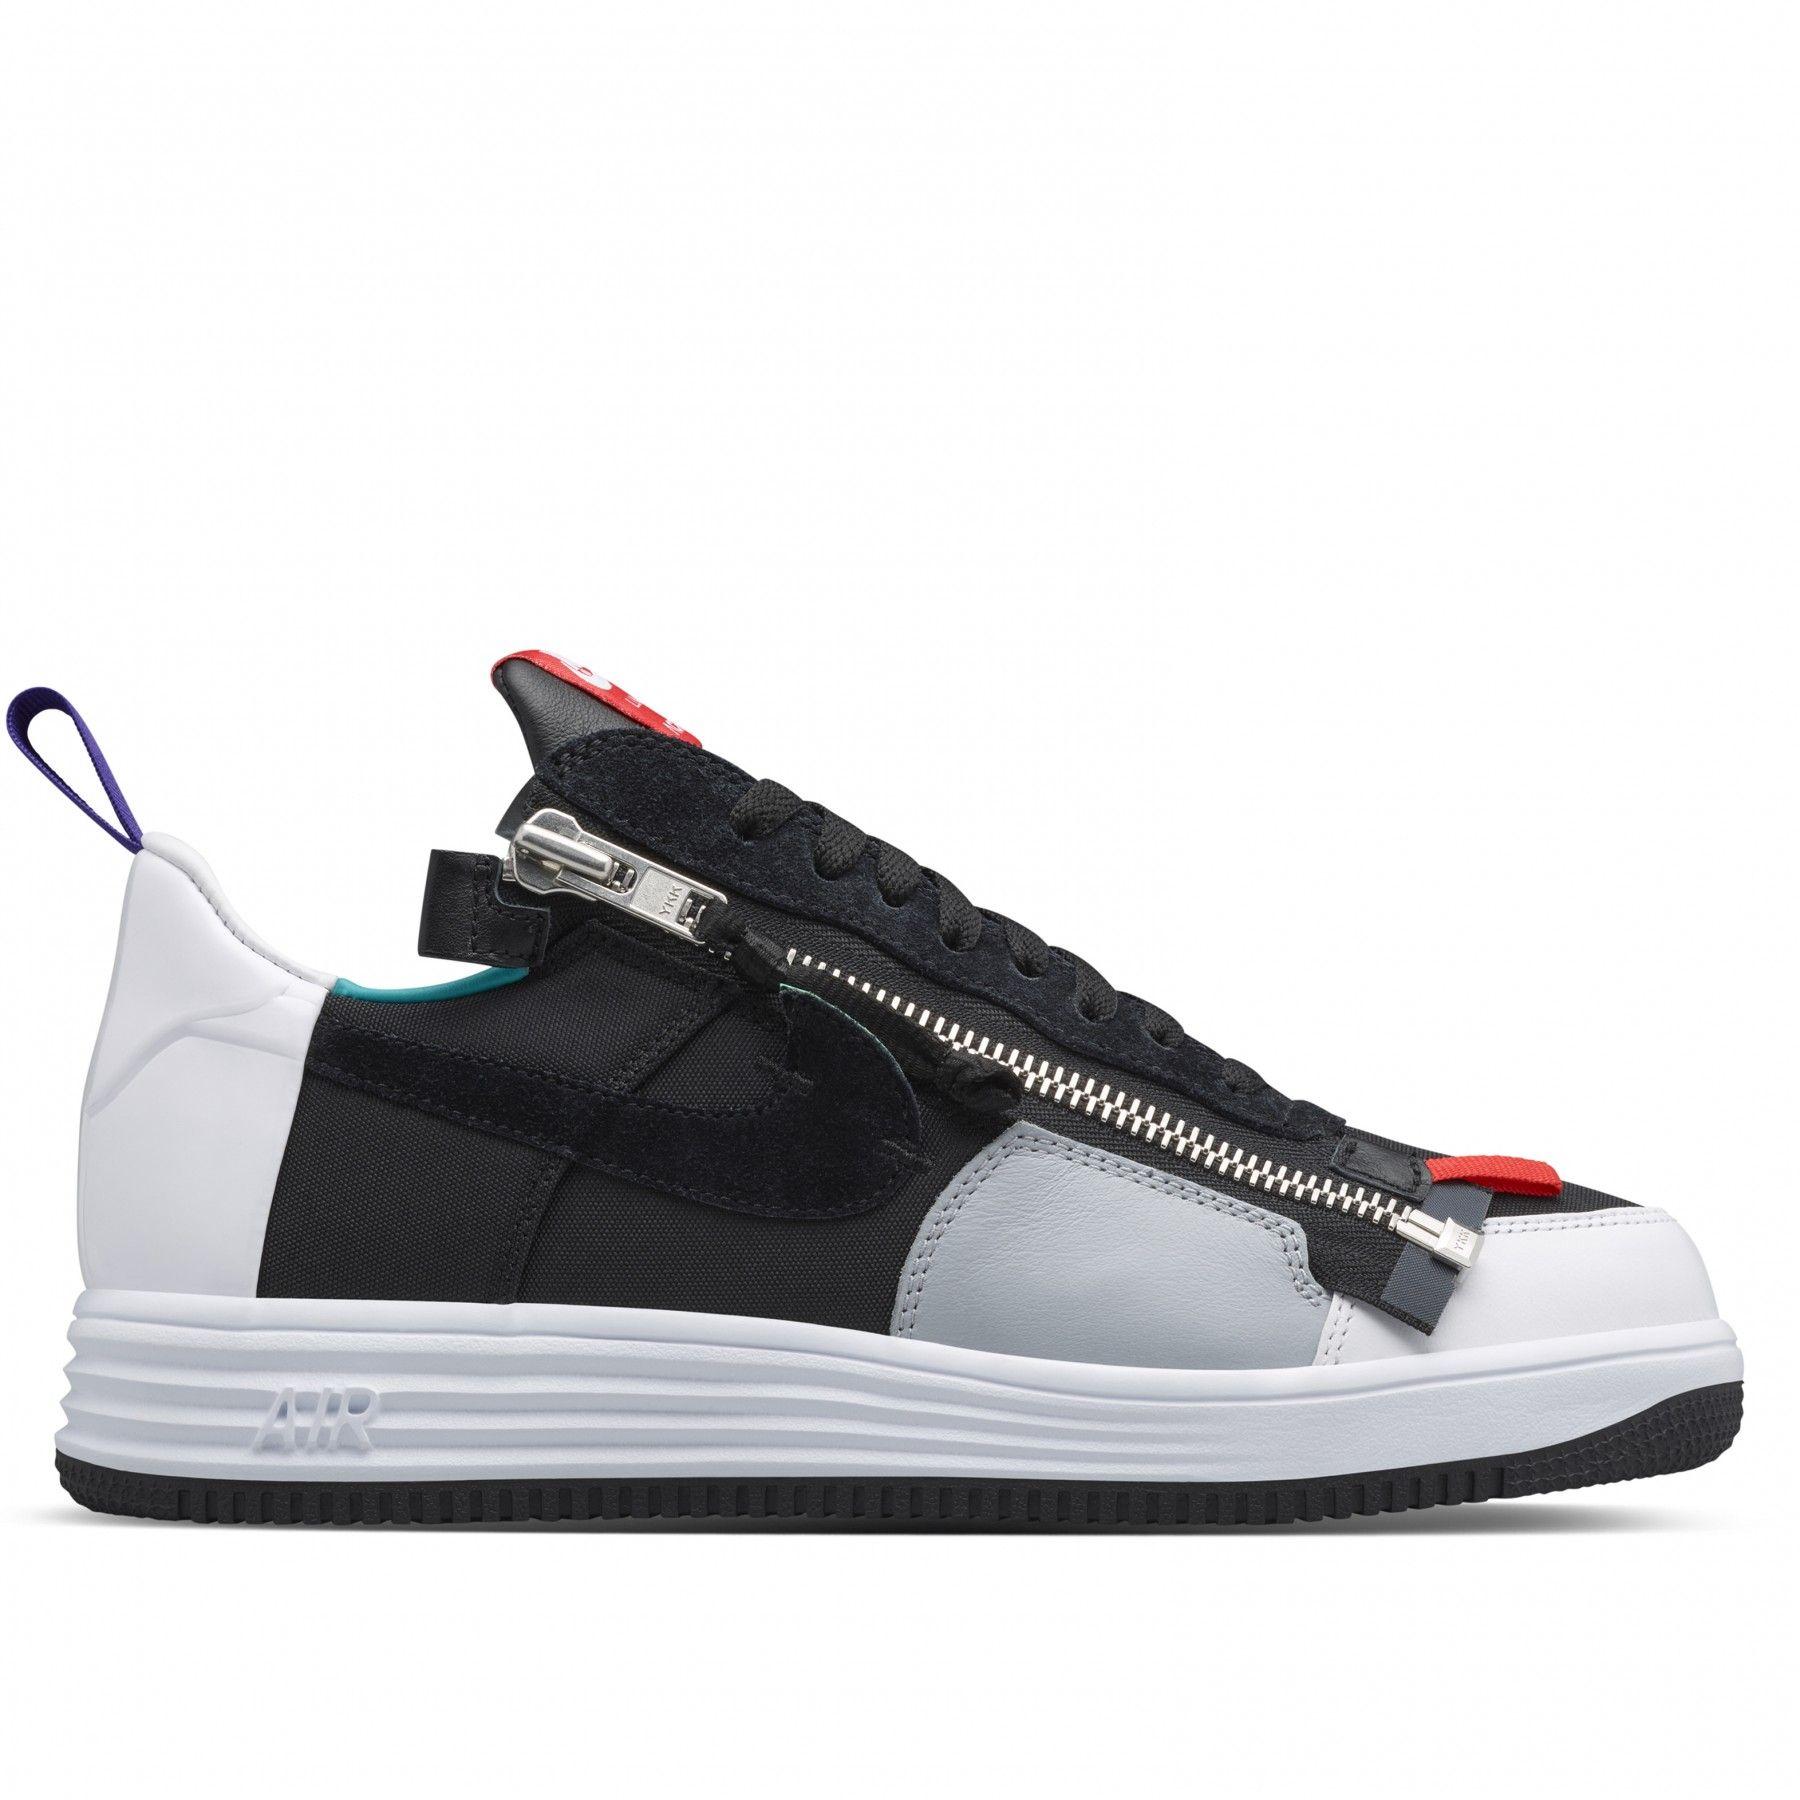 NikeLab x Acronym Lunar Force 1 (Black/White) · Nike LunarNike  SportswearFootwearShoeShoesZapatos